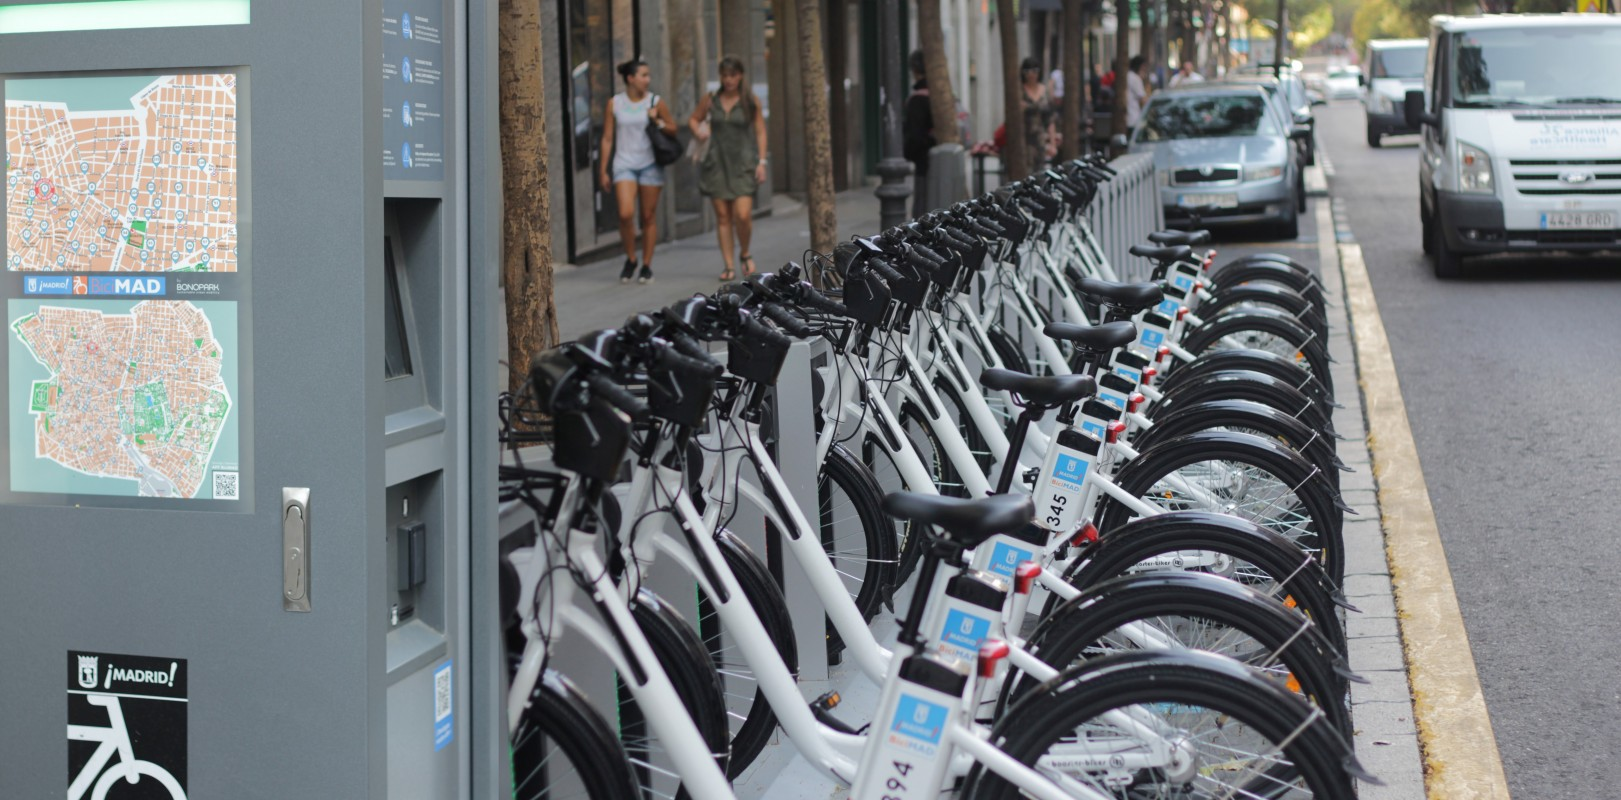 BiciMAD. The public bike rental service in Madrid